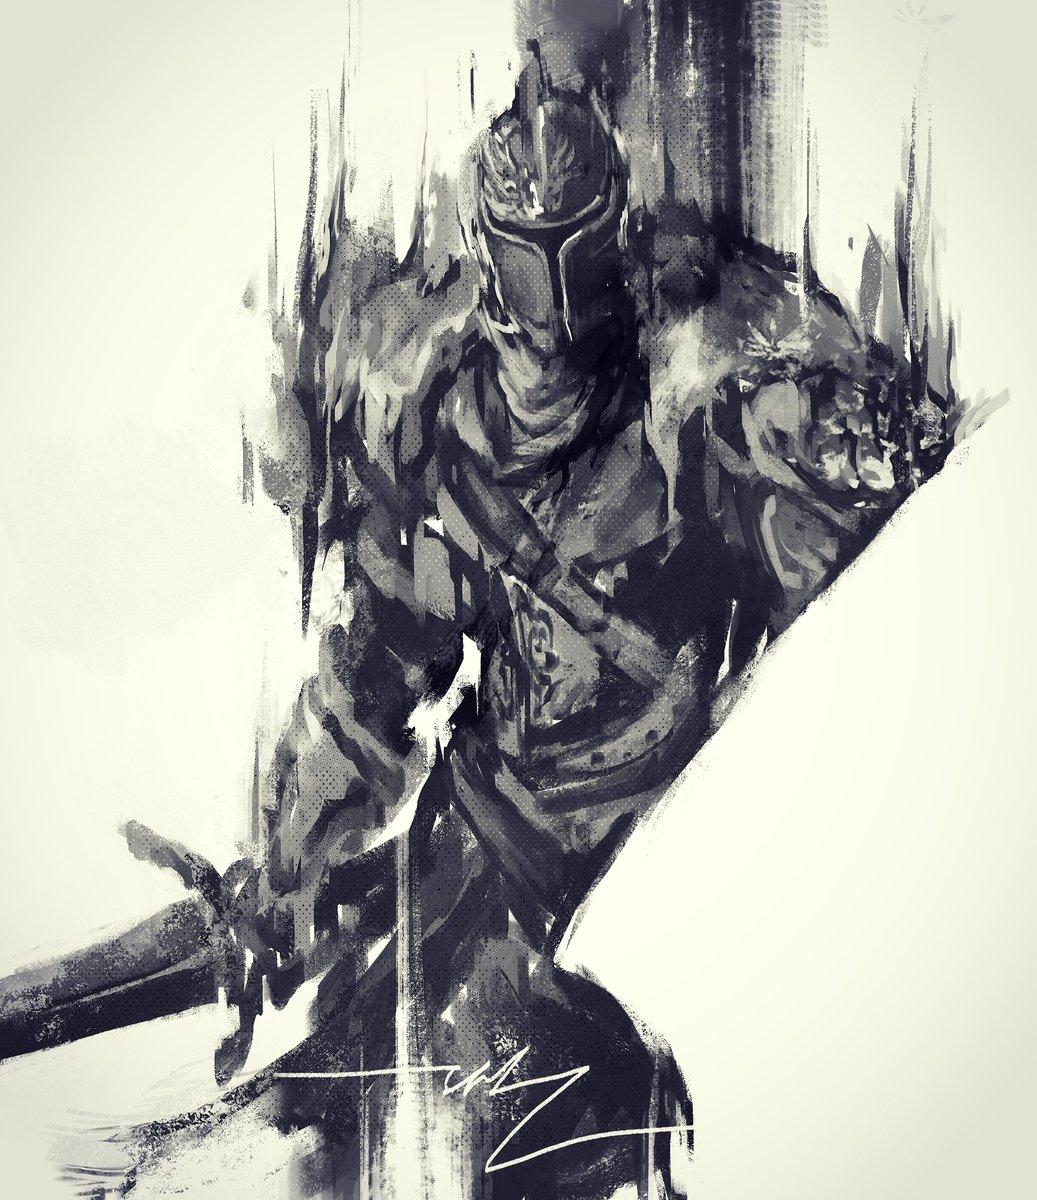 Shimhaq On Twitter Faraam Knight Love Drawing This Guy Faraam Knight Sketch Art Draw Digitalart Darksouls